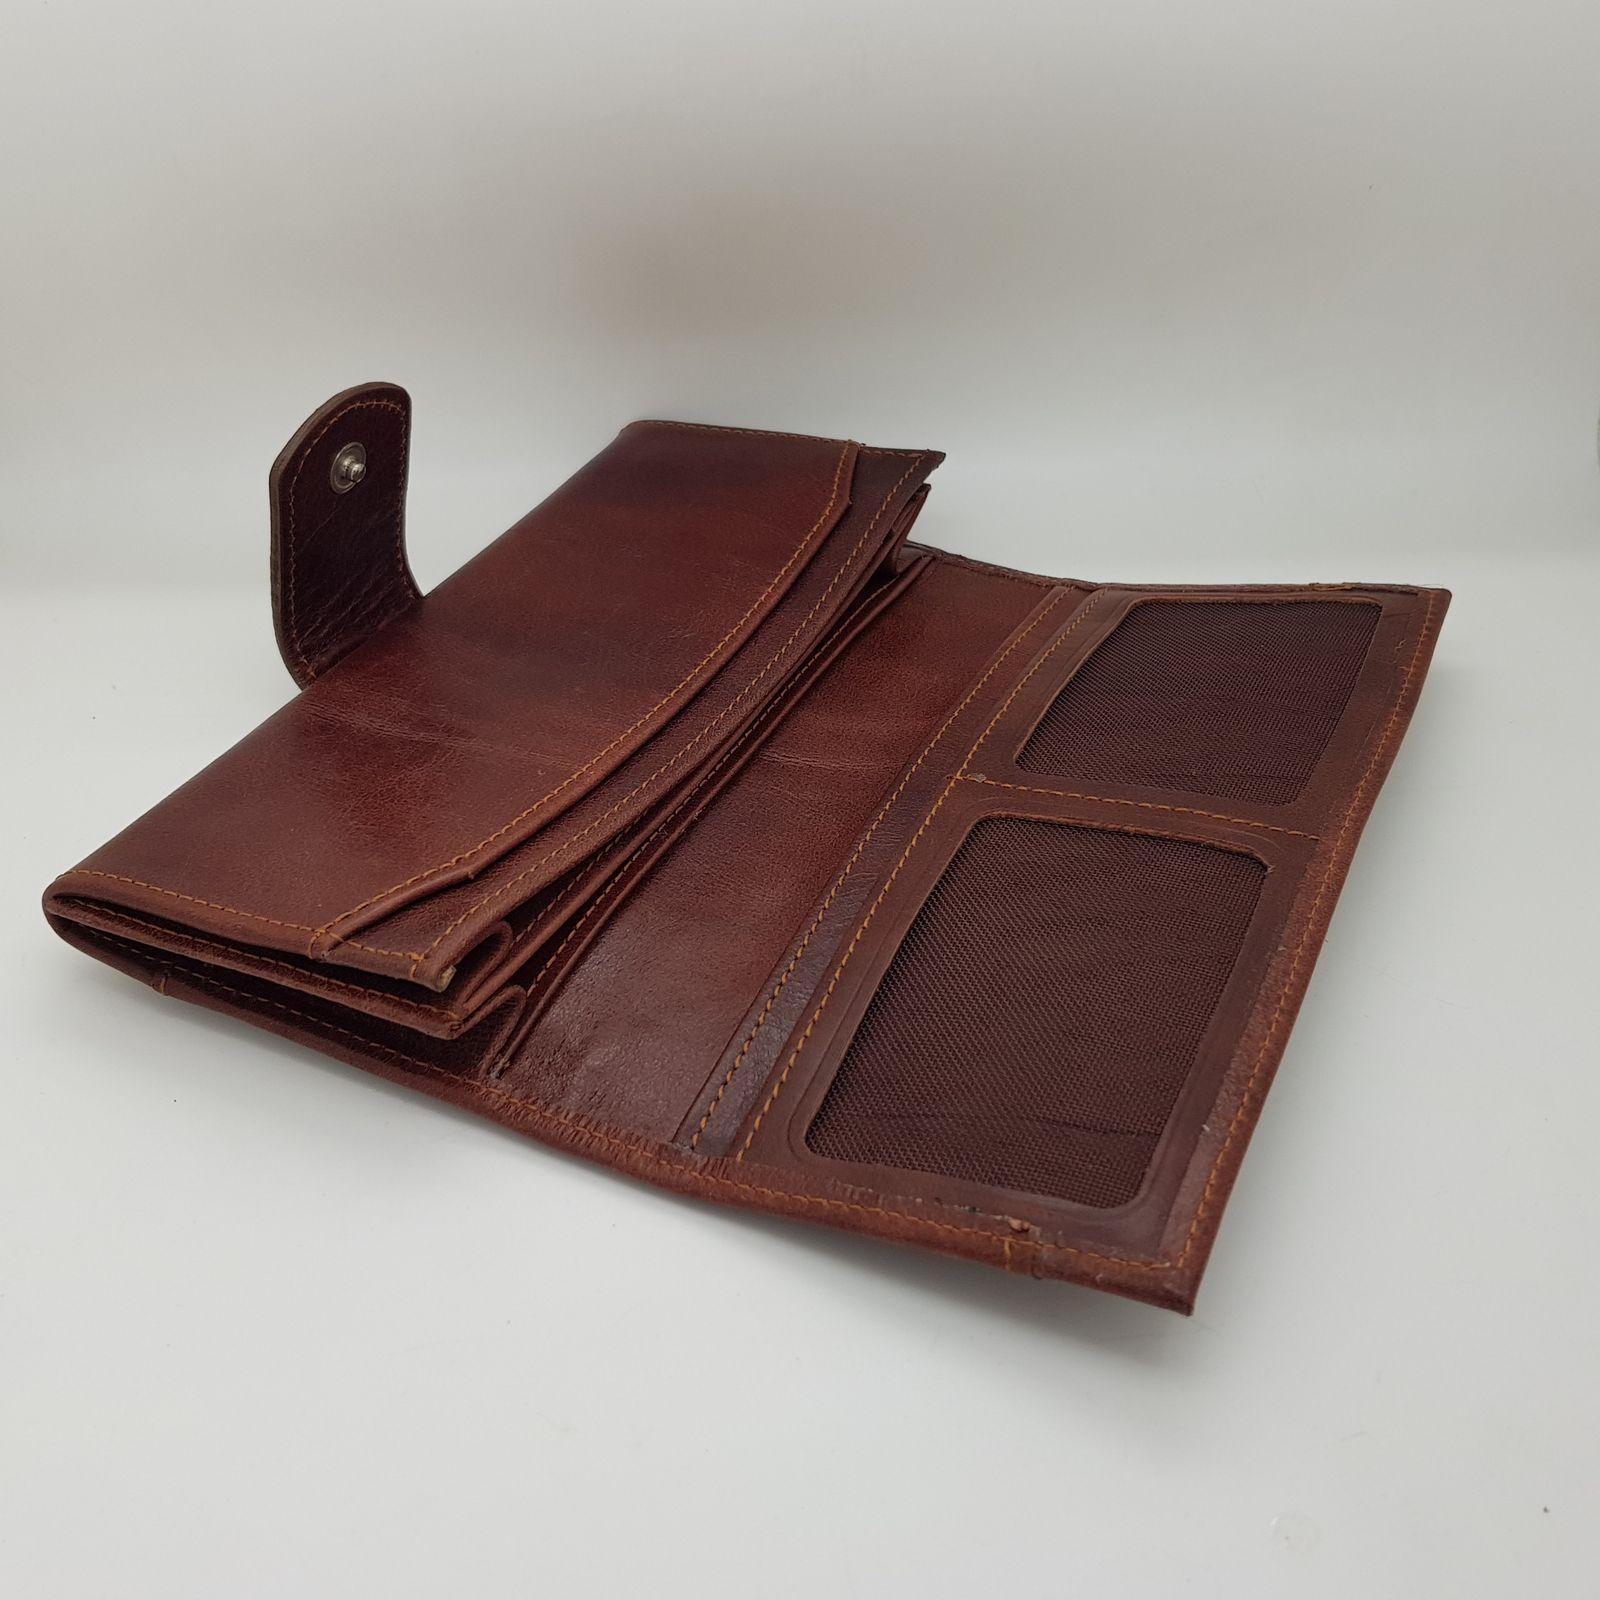 کیف پول زنانه چرم دیاکو مدل 315 -  - 11